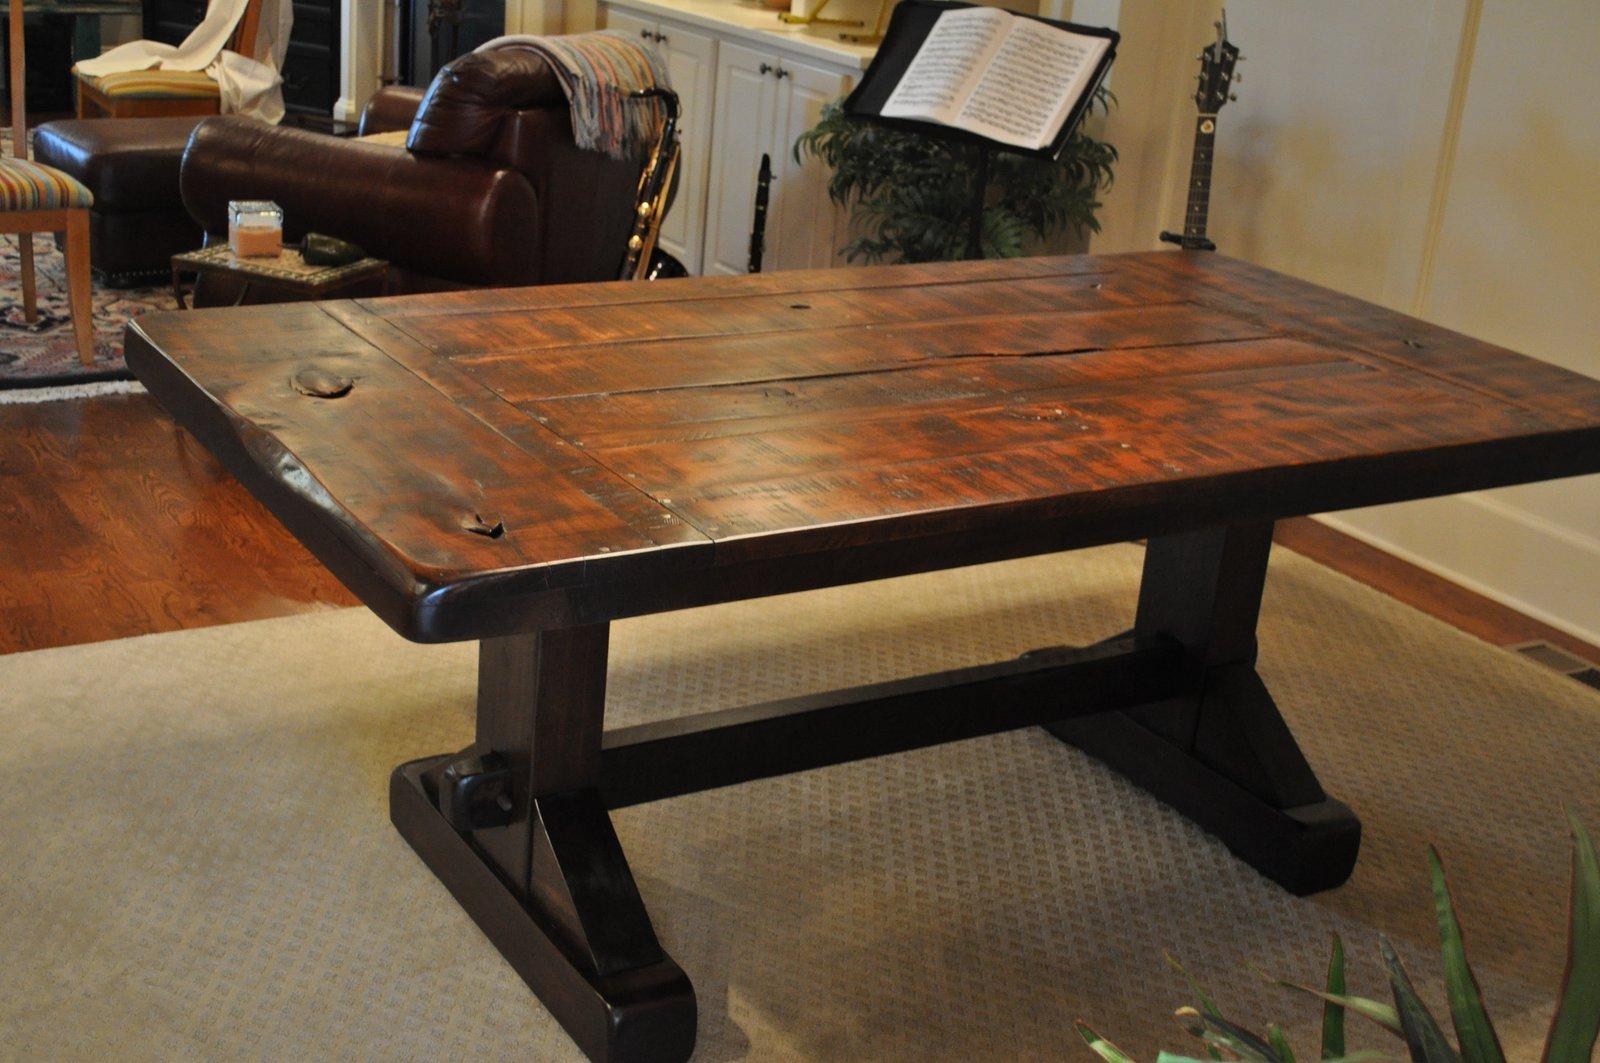 The Emerson Rustic Trestle Dining Table | Atlanta Georgia | Rustic Trades  Furniture